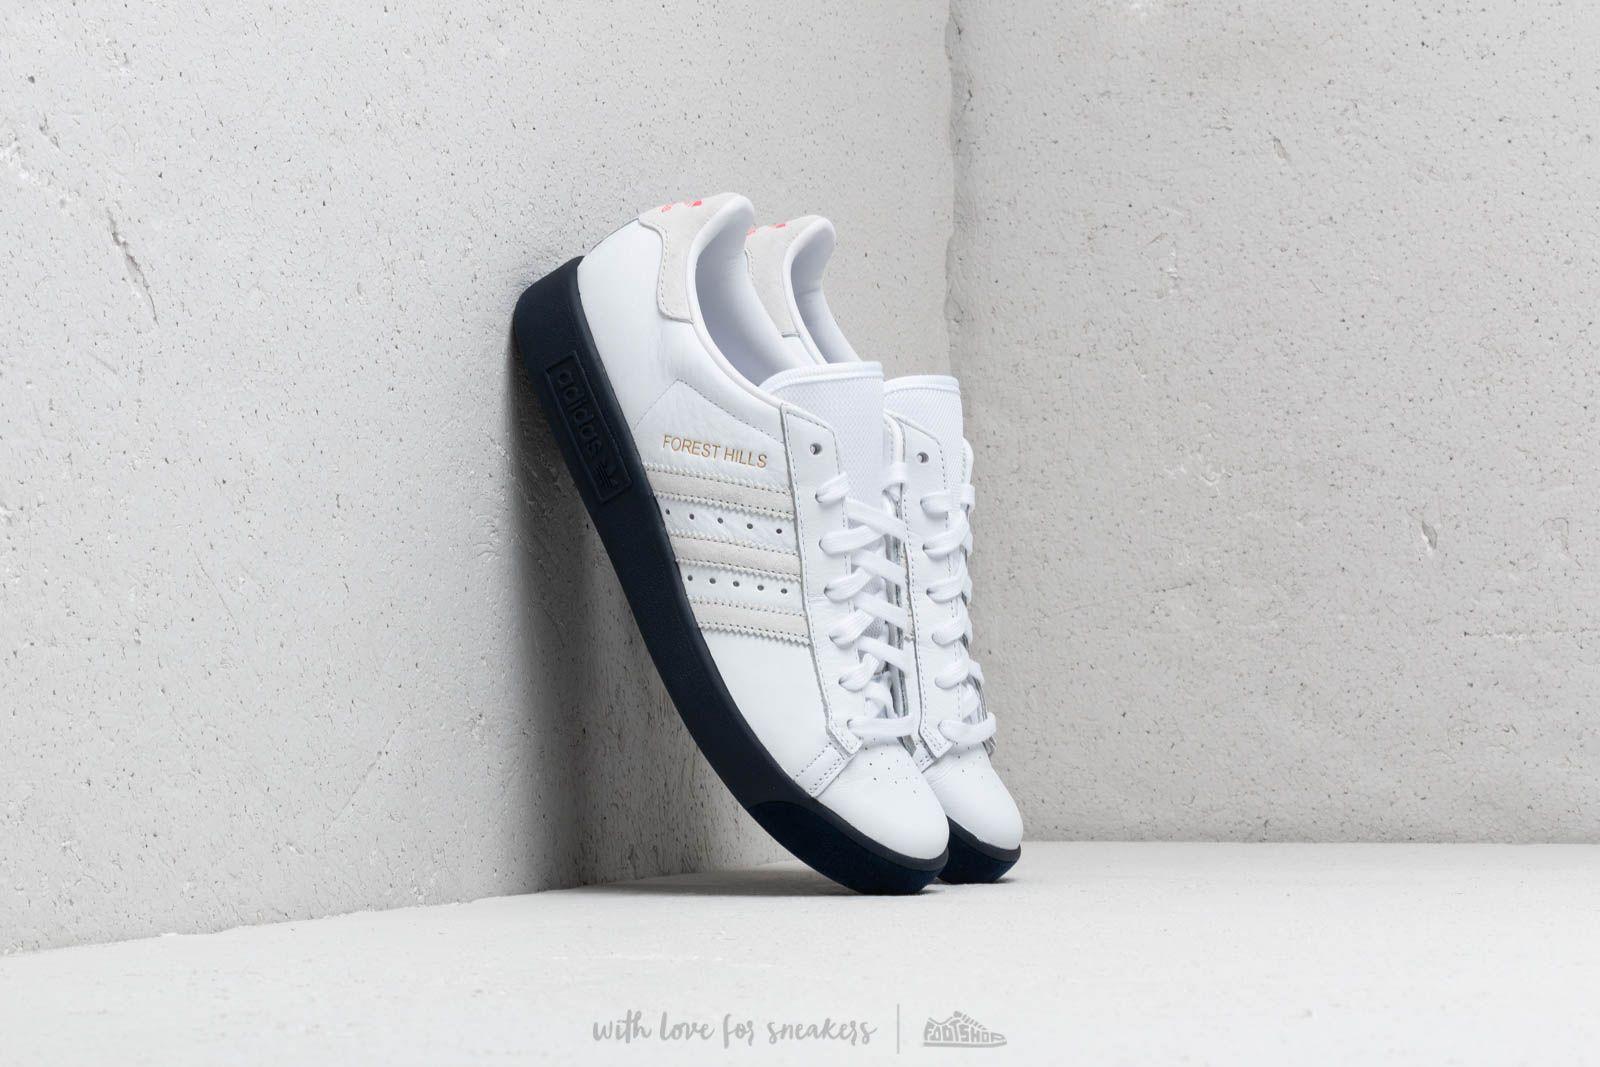 adidas Forest Hills Ftw White Crystal White Nindig | Footshop